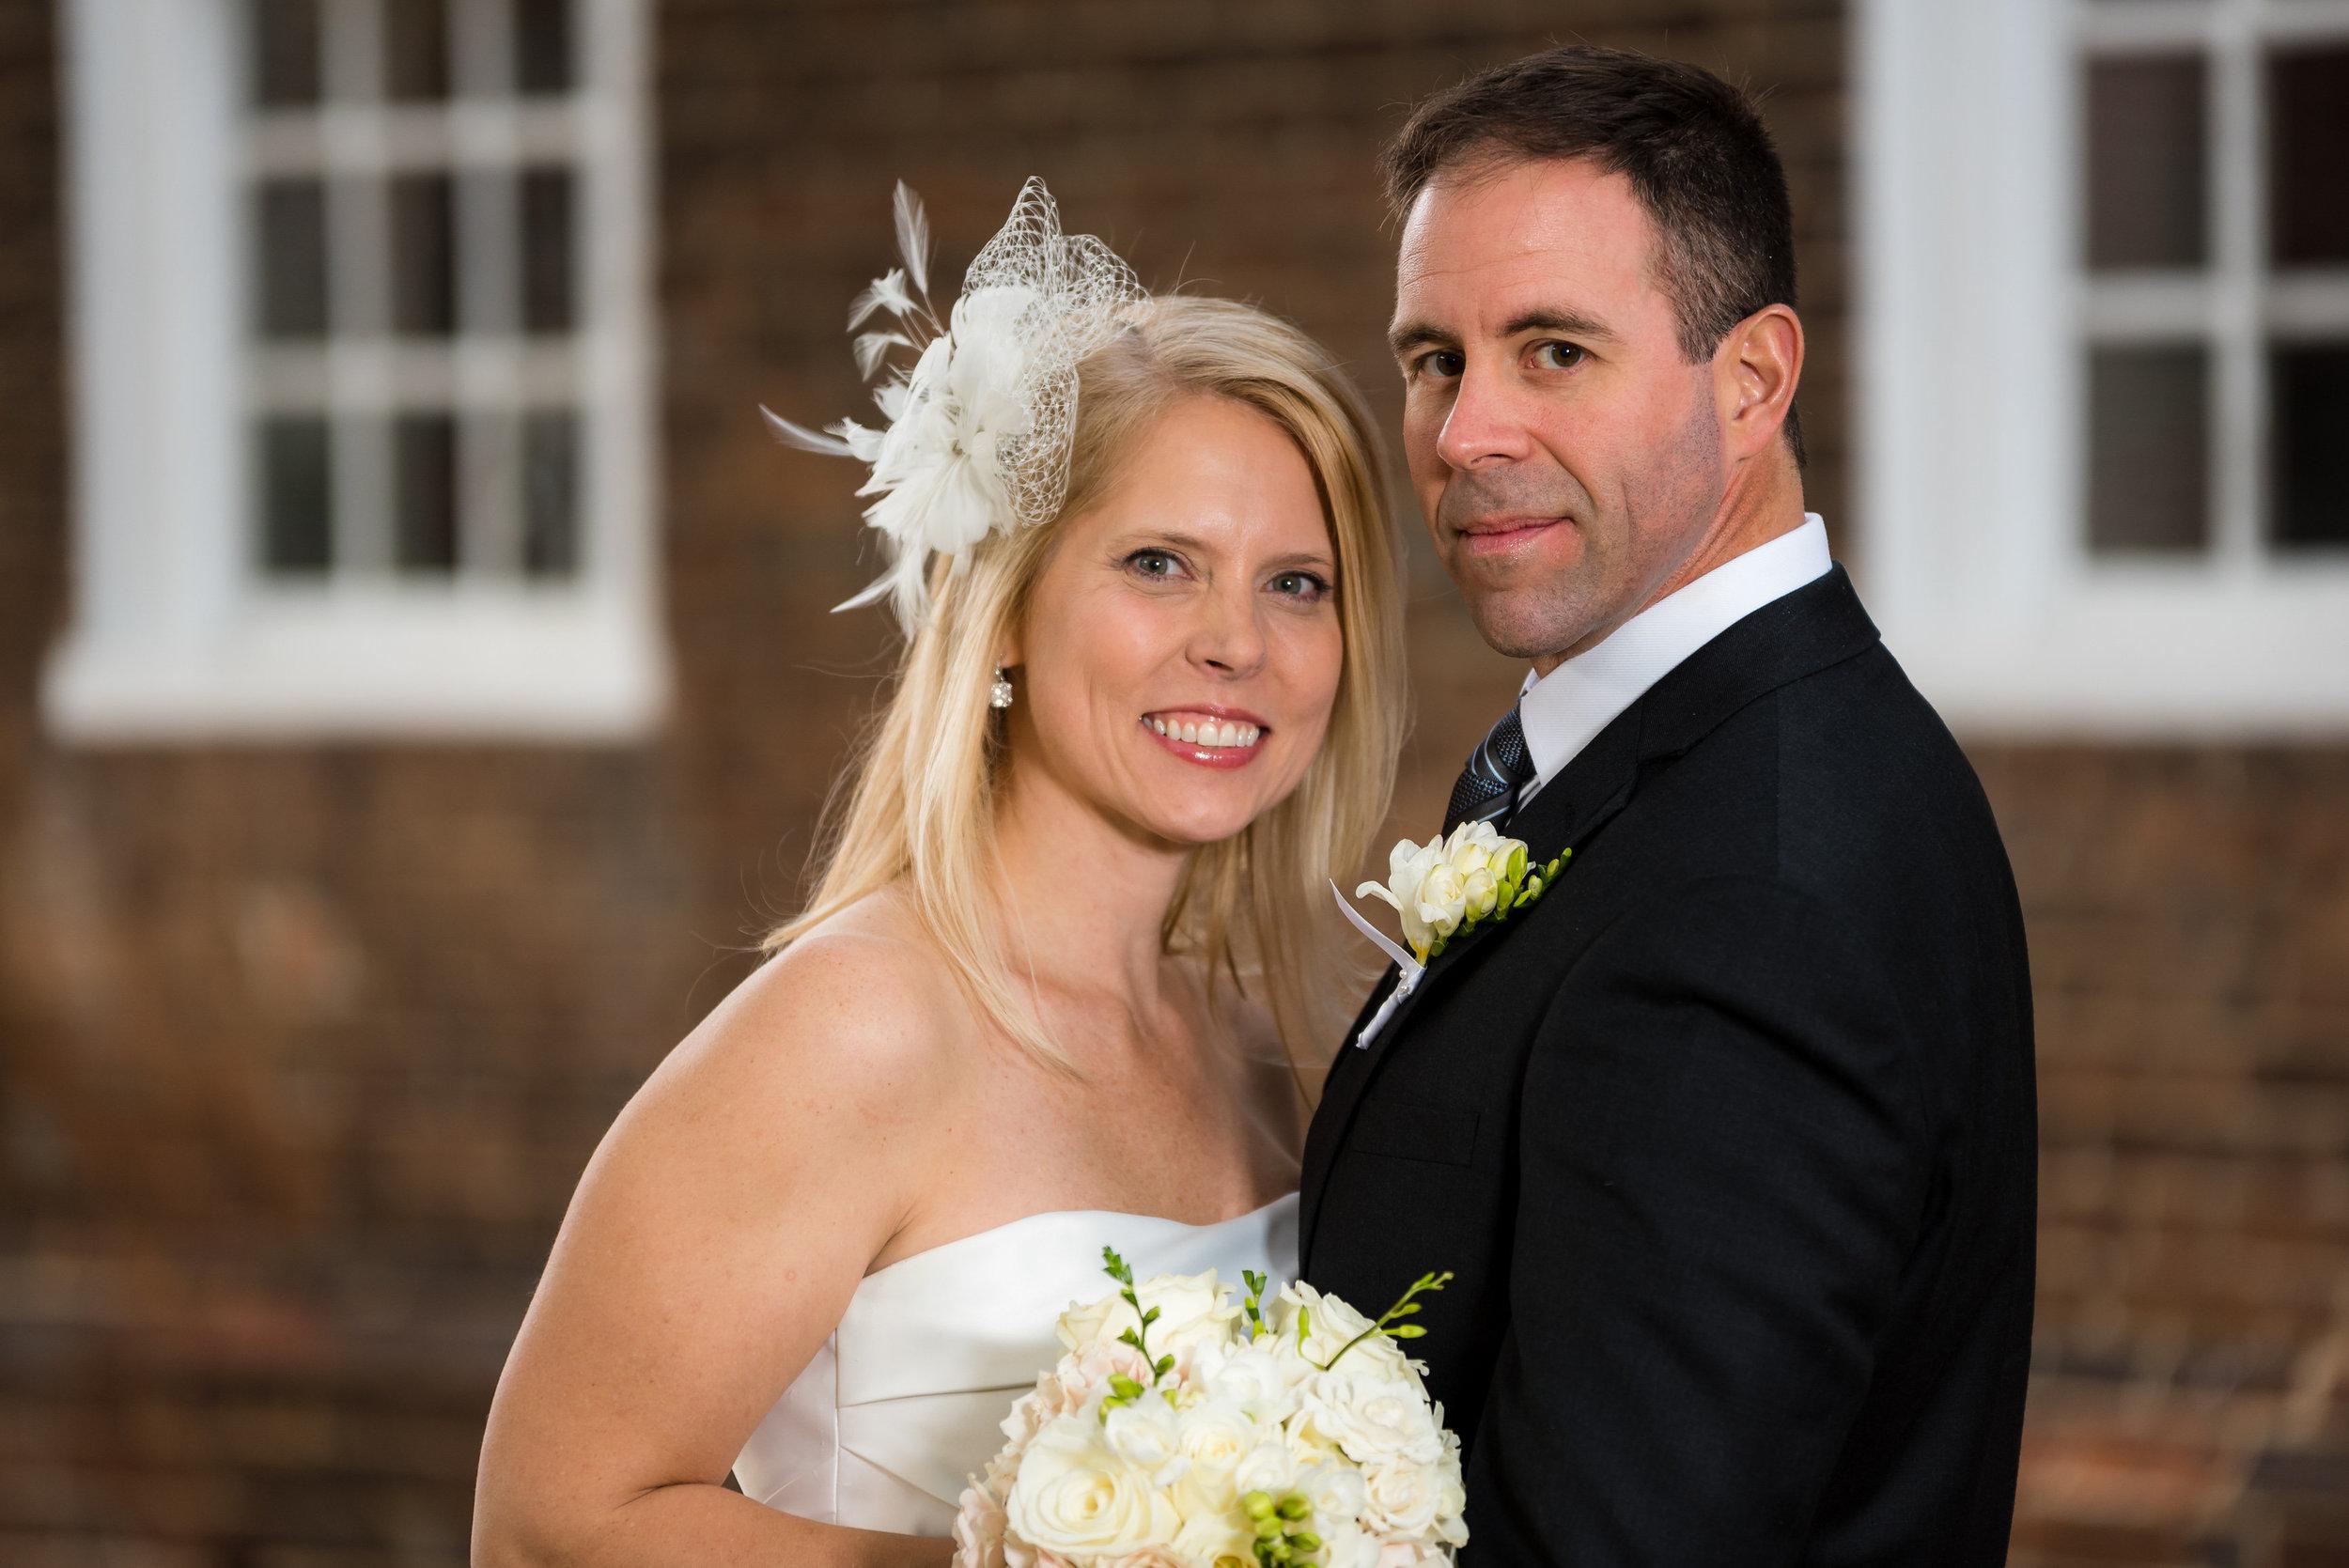 20151024_Helju&Matt_Alexandria-va-WeddingPhotography_TJF3691.jpg